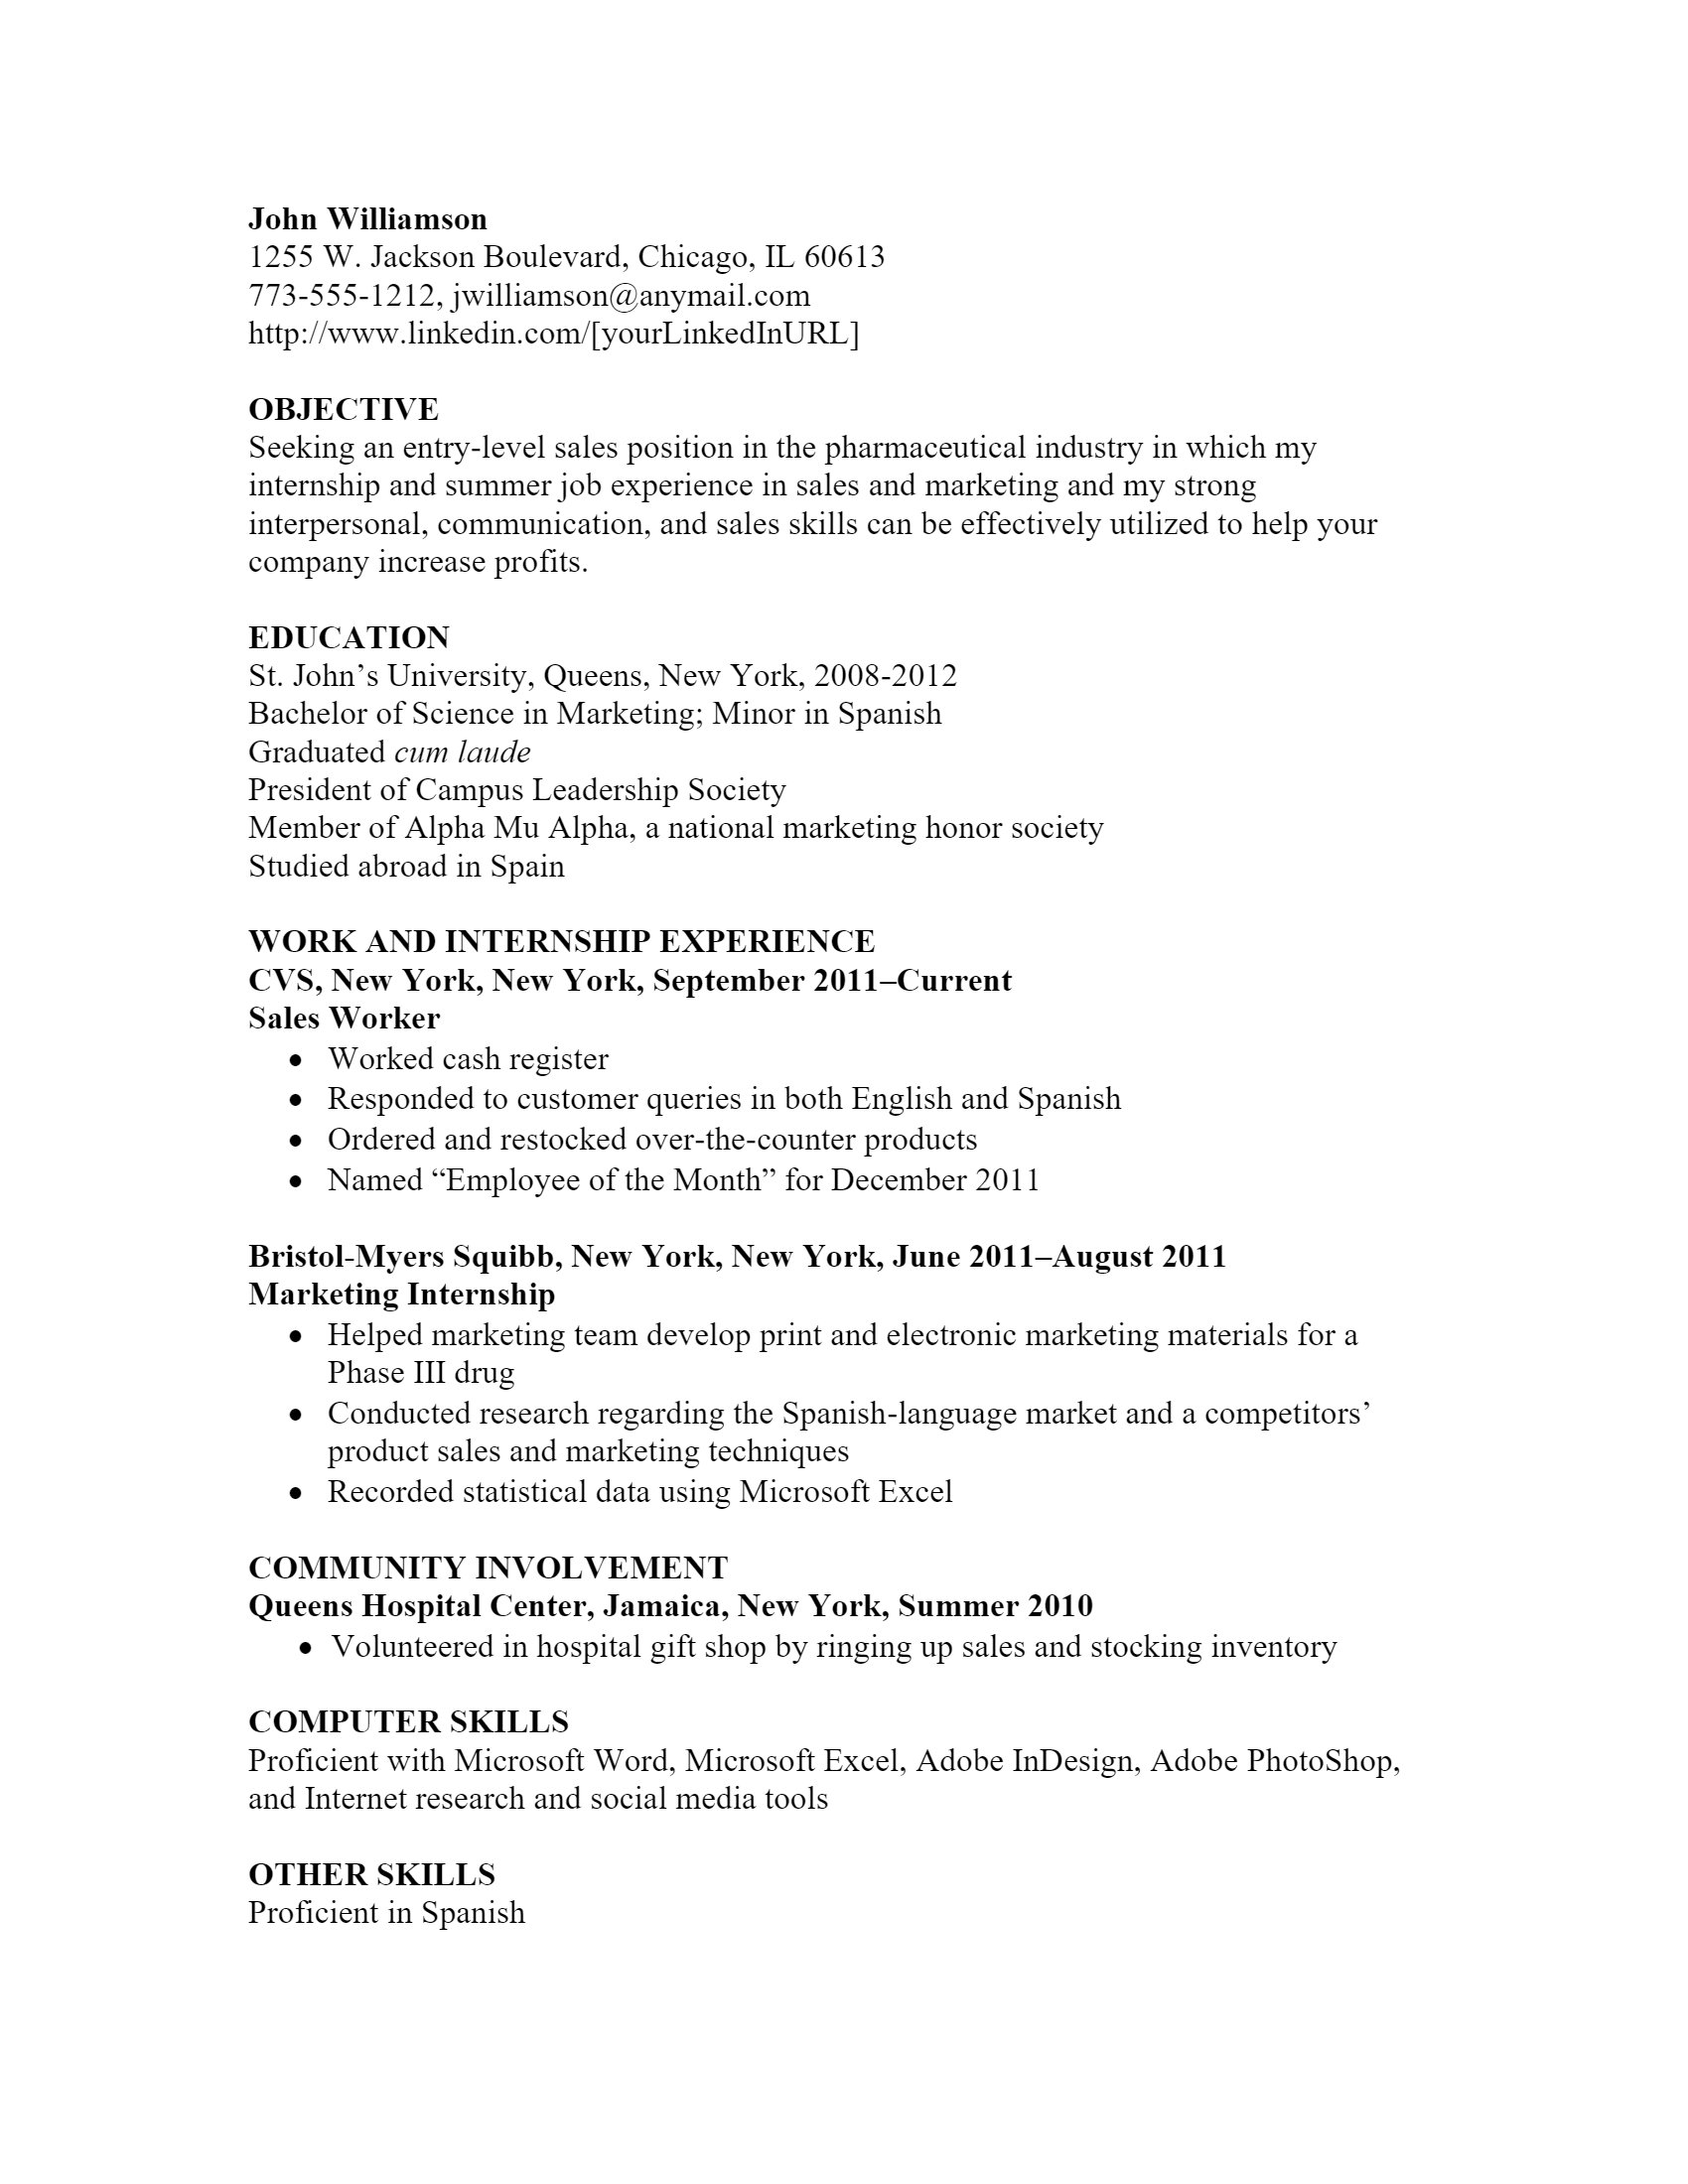 Marketing Sales Resume > Marketing Sales Resume .Docx (Word)